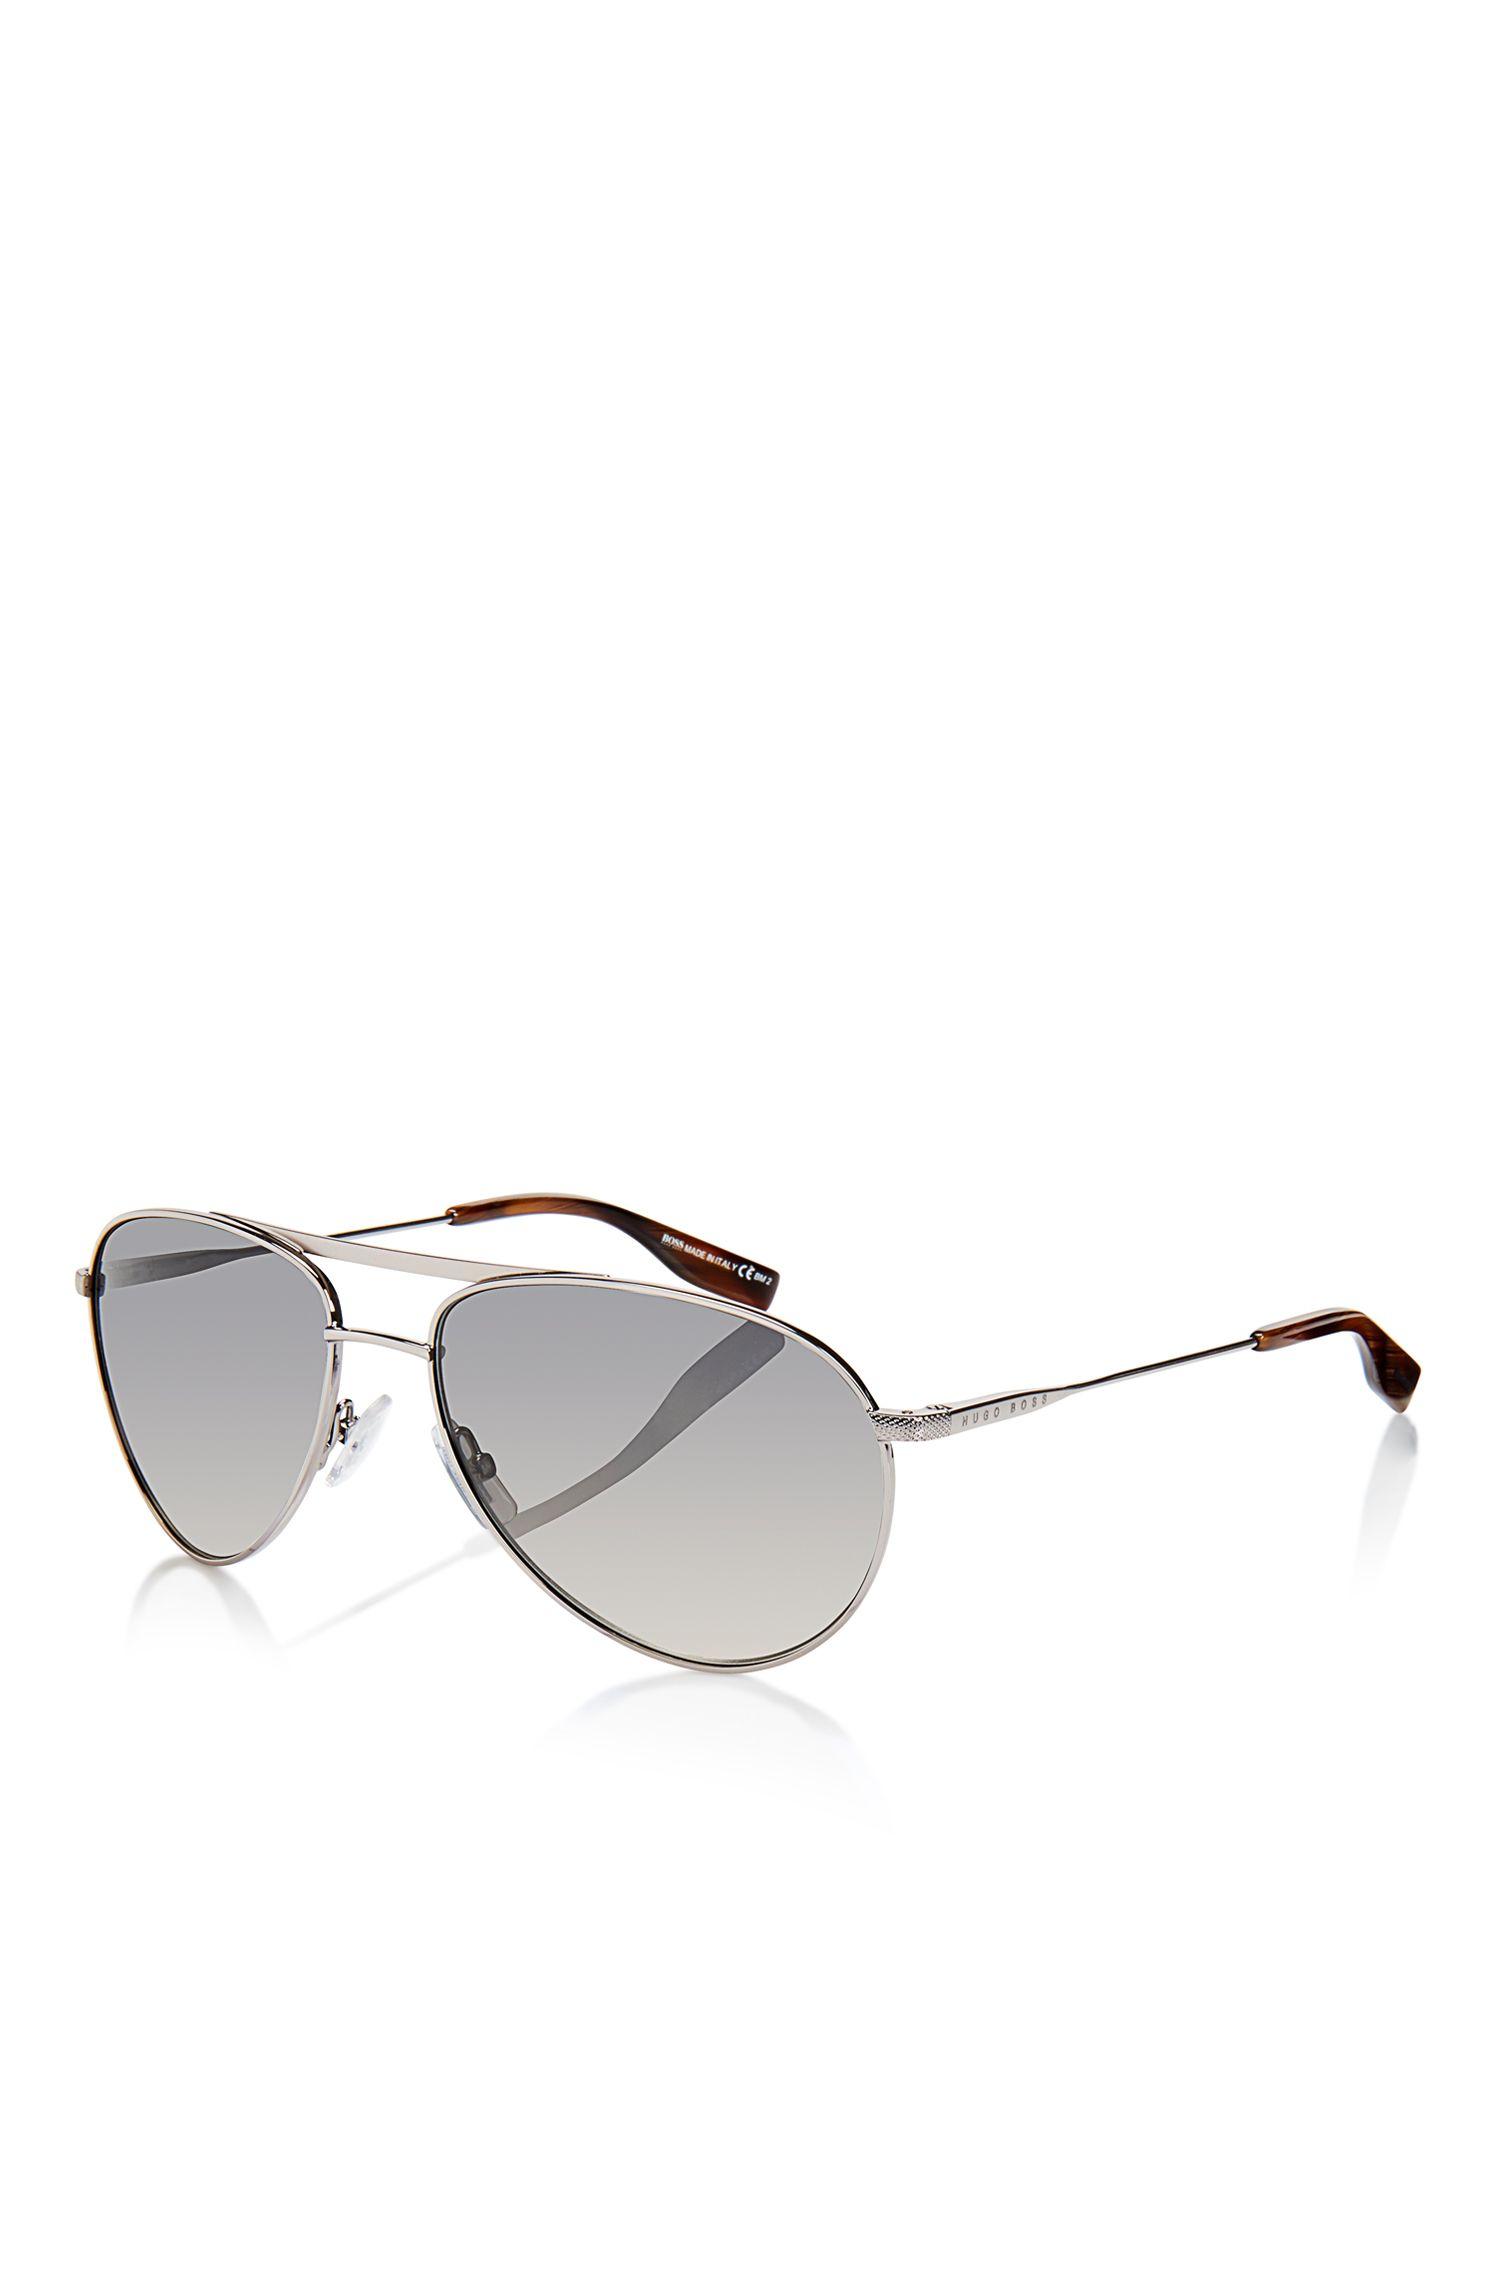 Grey Lens Flex Hinge Aviator Sunglasses | Sunglasses